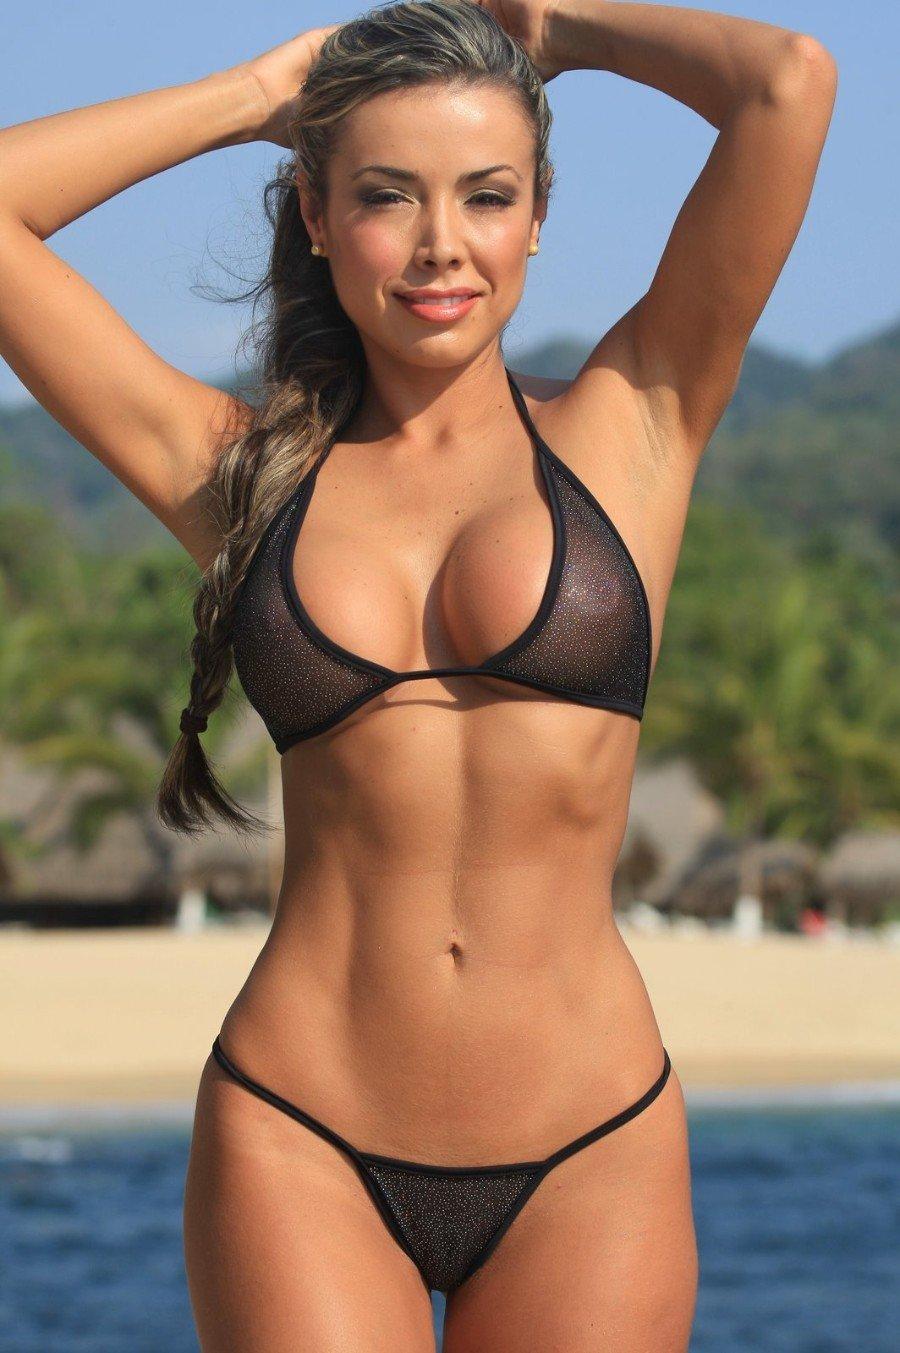 hot-girls-in-bikinisass-shot-threesome-cave-sex-toon